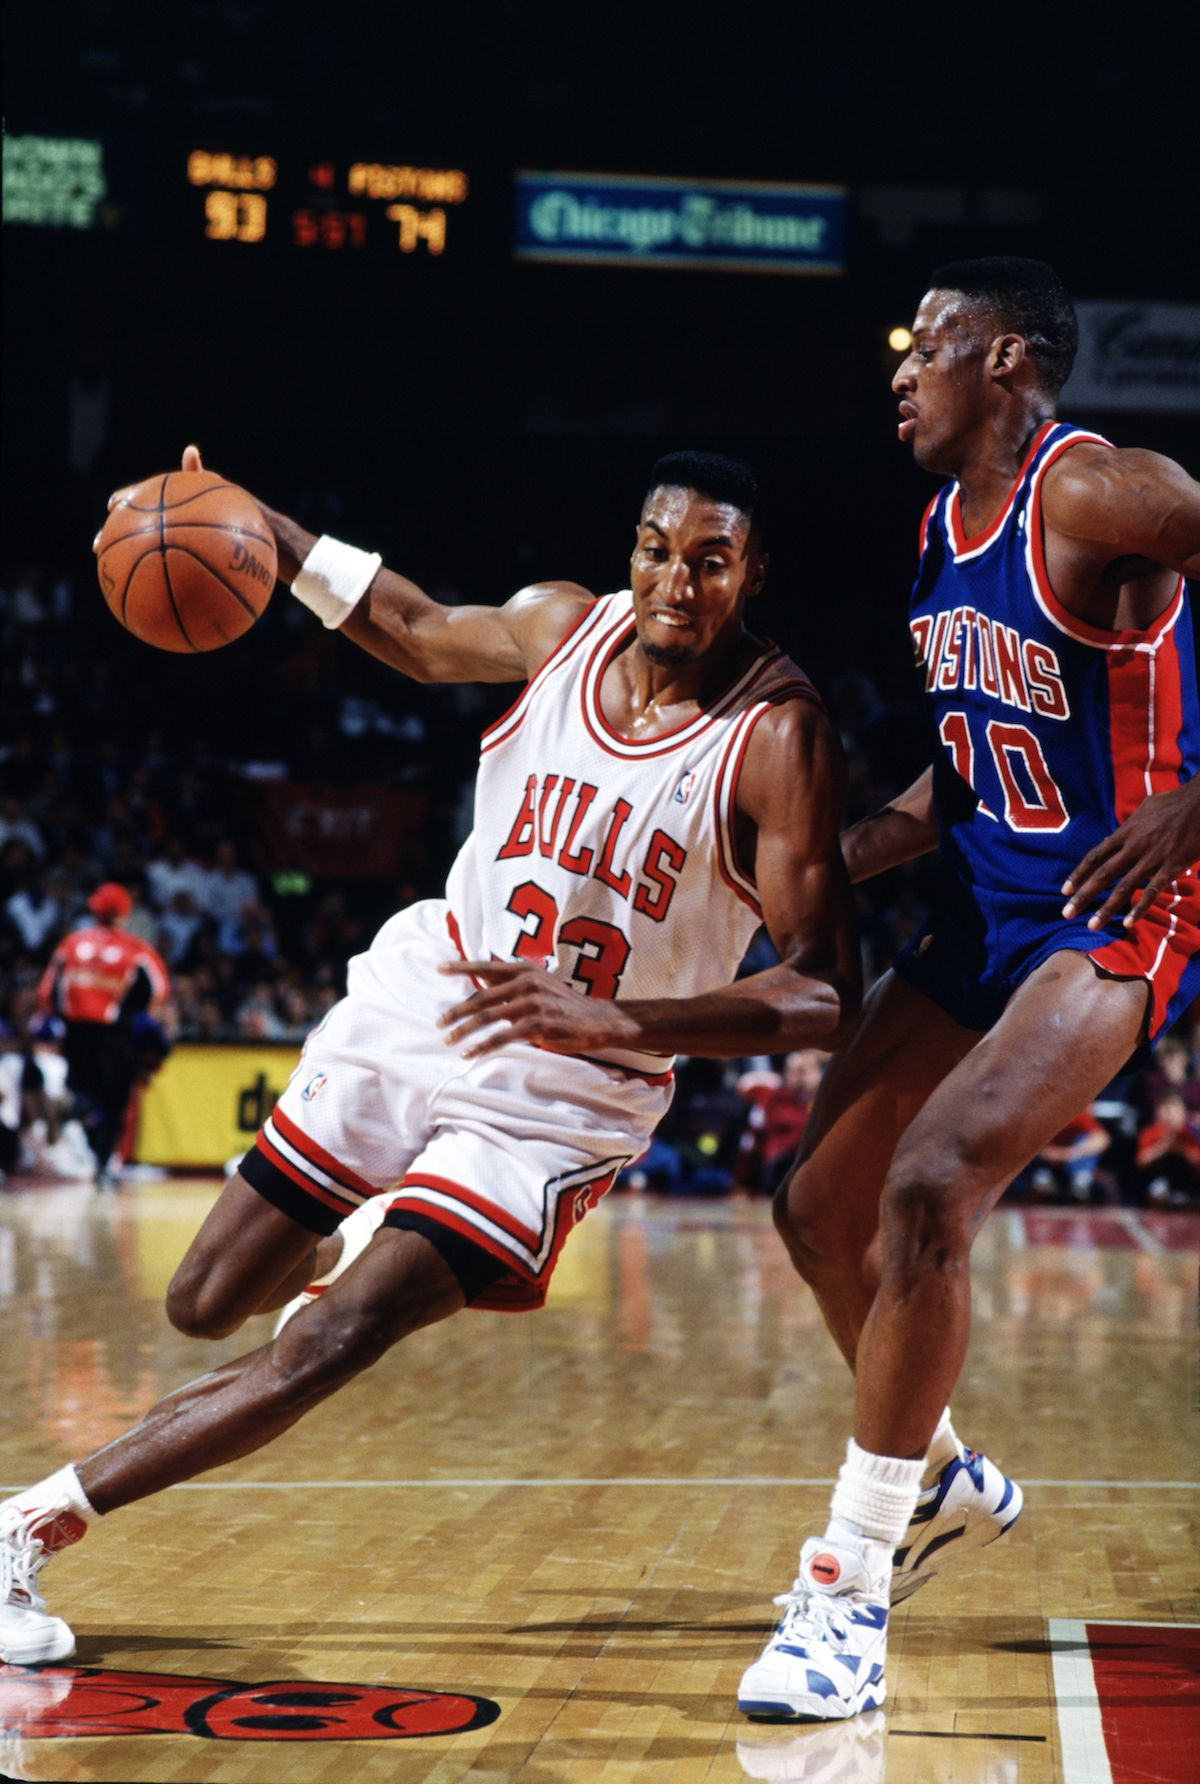 3e0f3d60e737 1990-Scottie-Pippen-drives-on-Dennis-Rodman-vs-DET